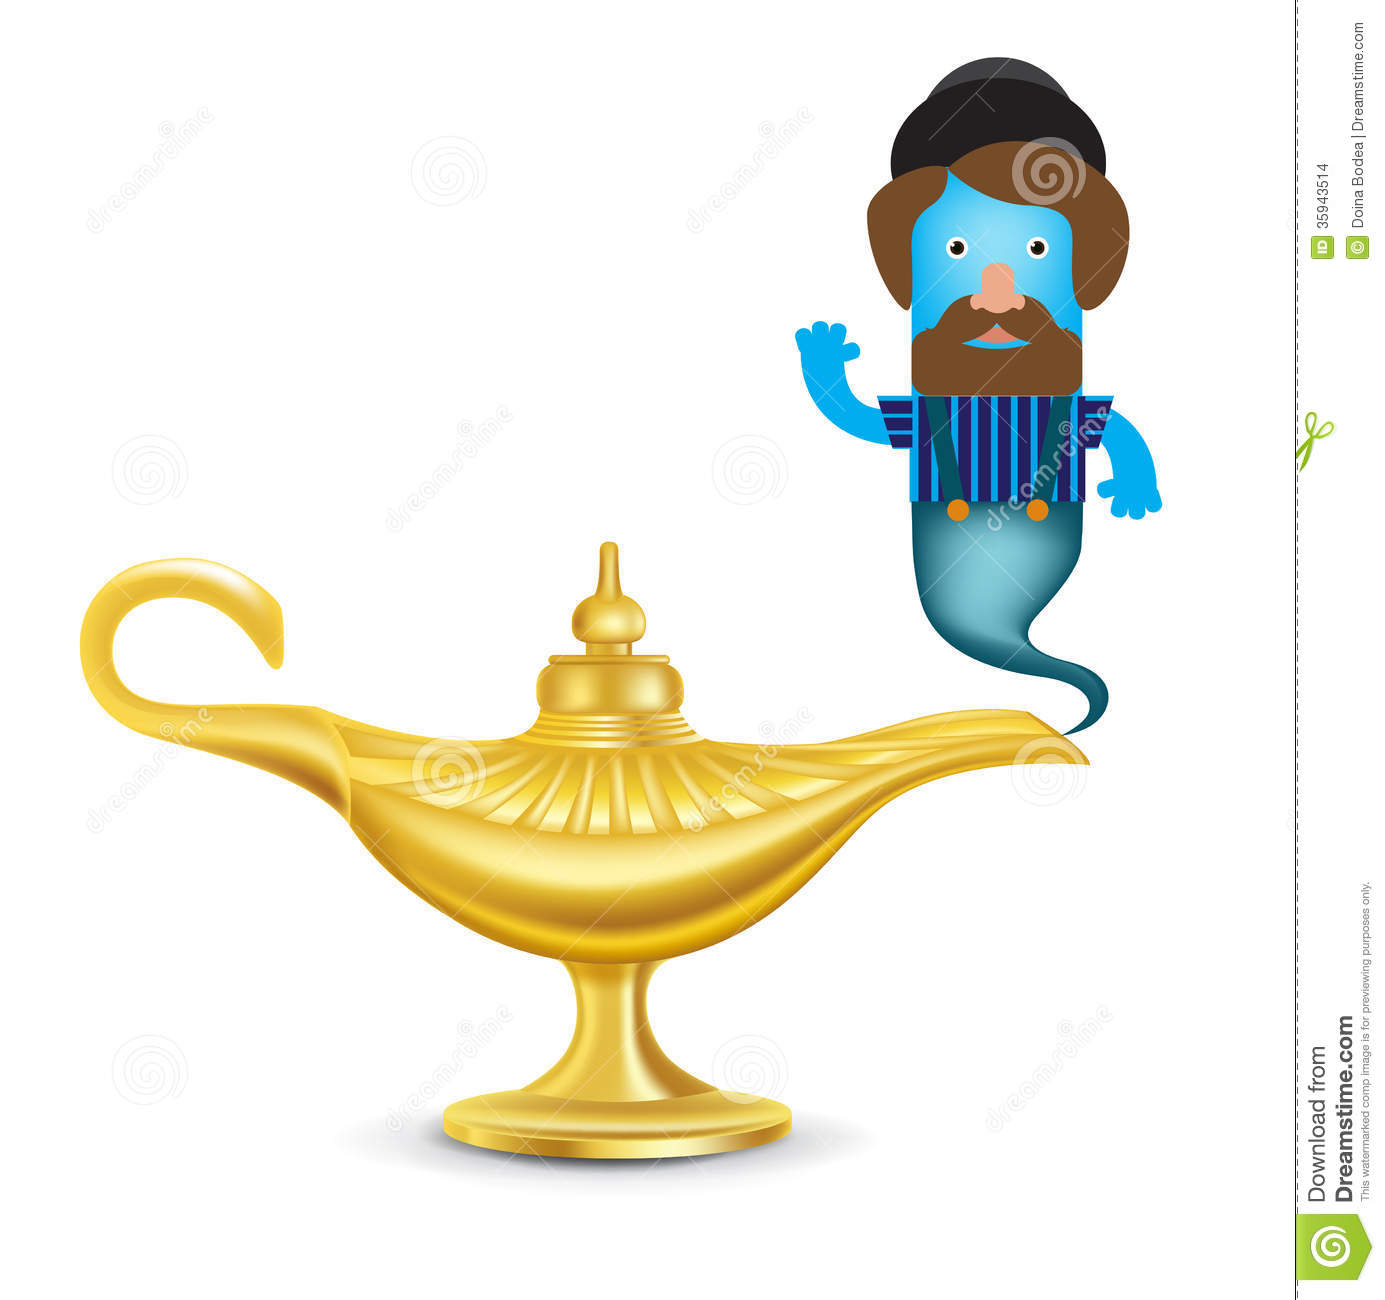 Lamps clipart genie lamp Lamp Genie Clipart Clipart Lamp